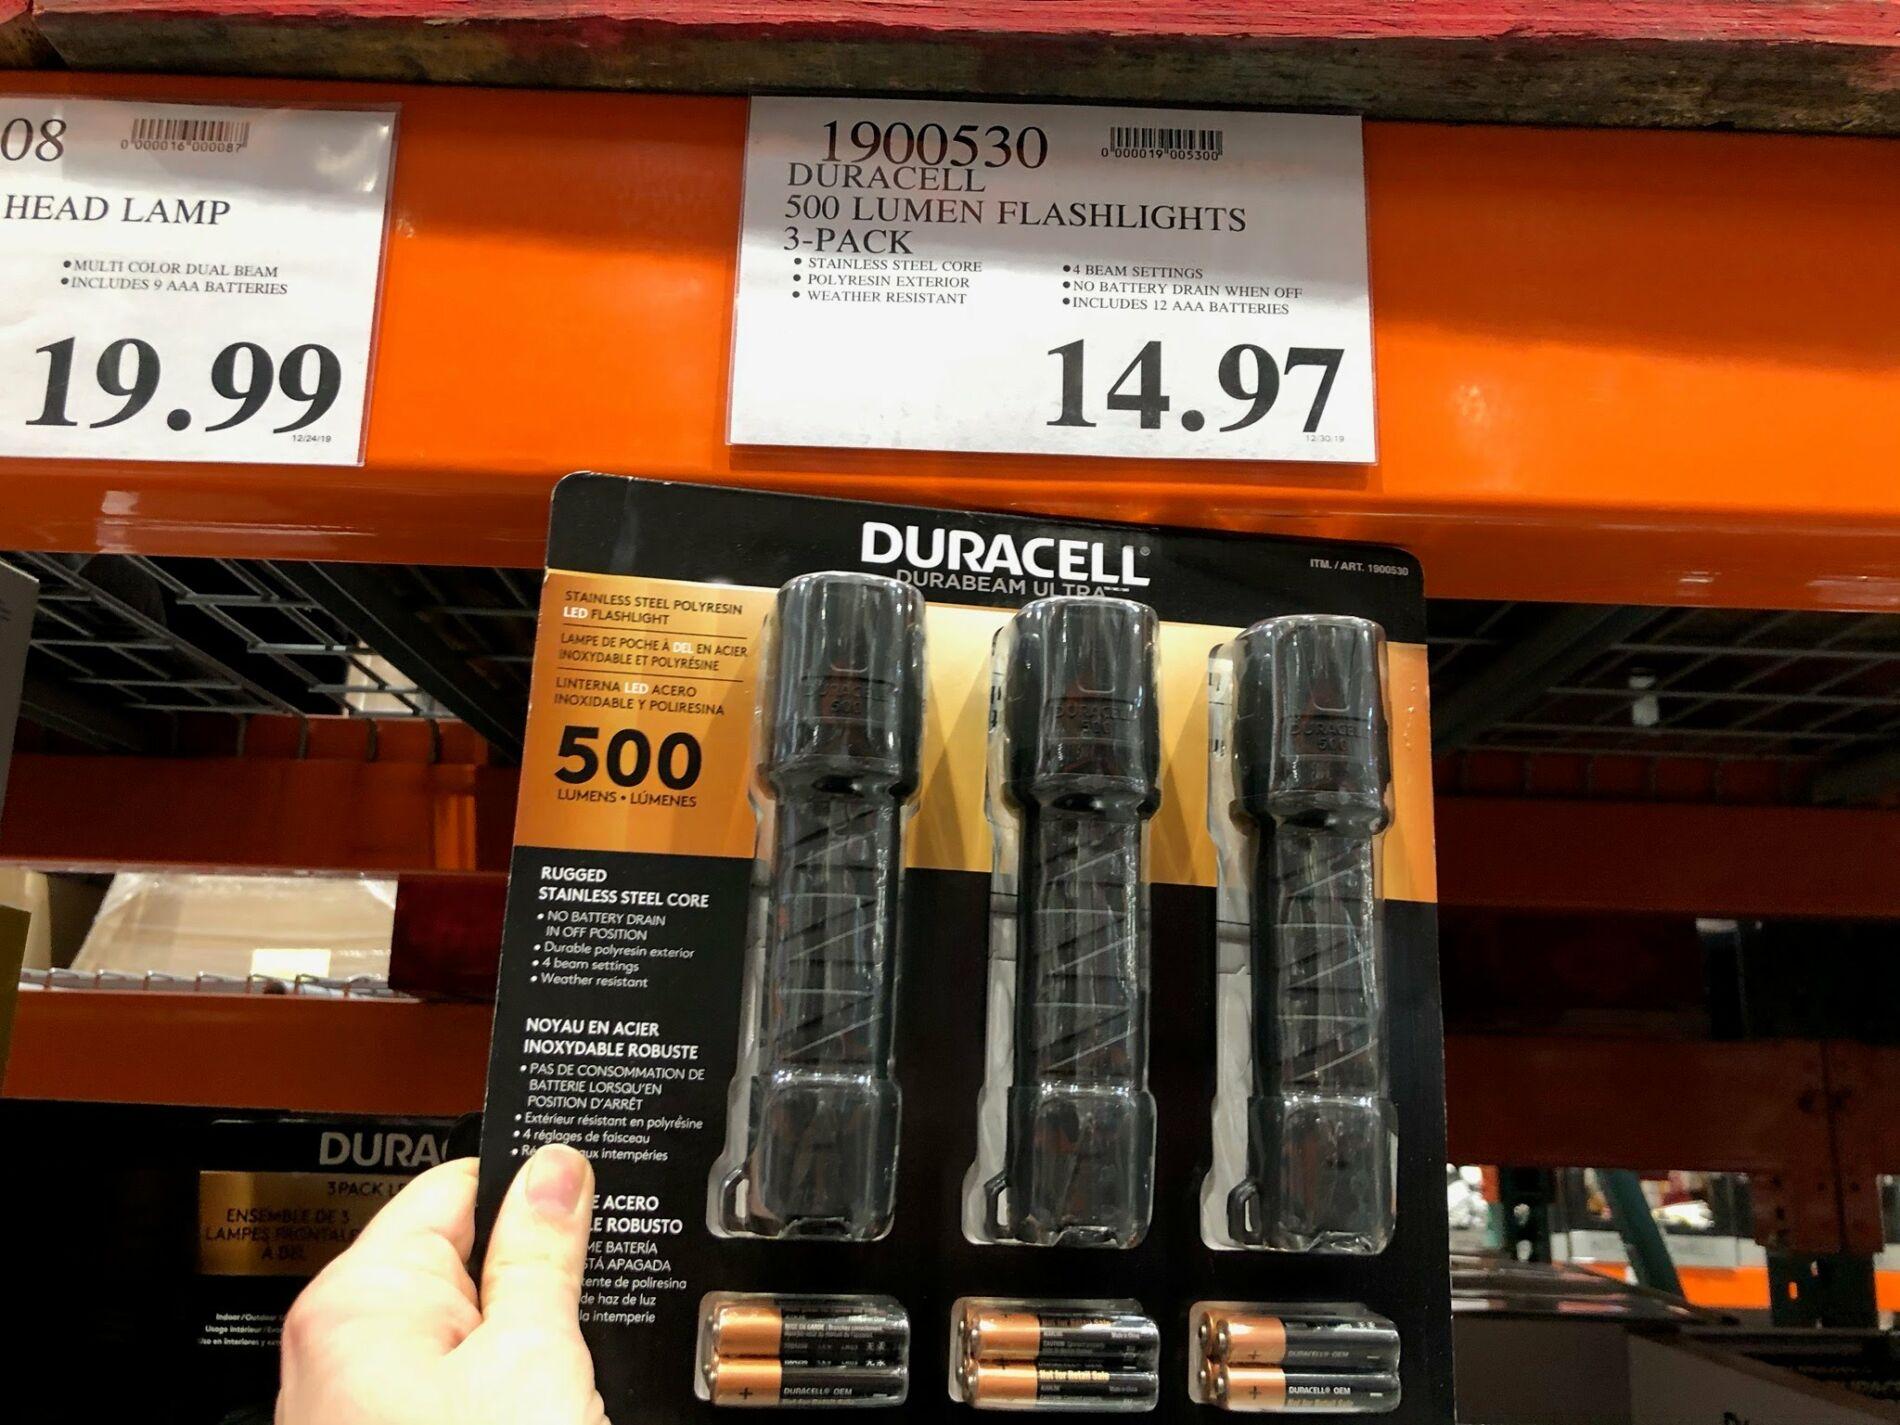 Duracell500LumenFlashlights3Pack-1900530